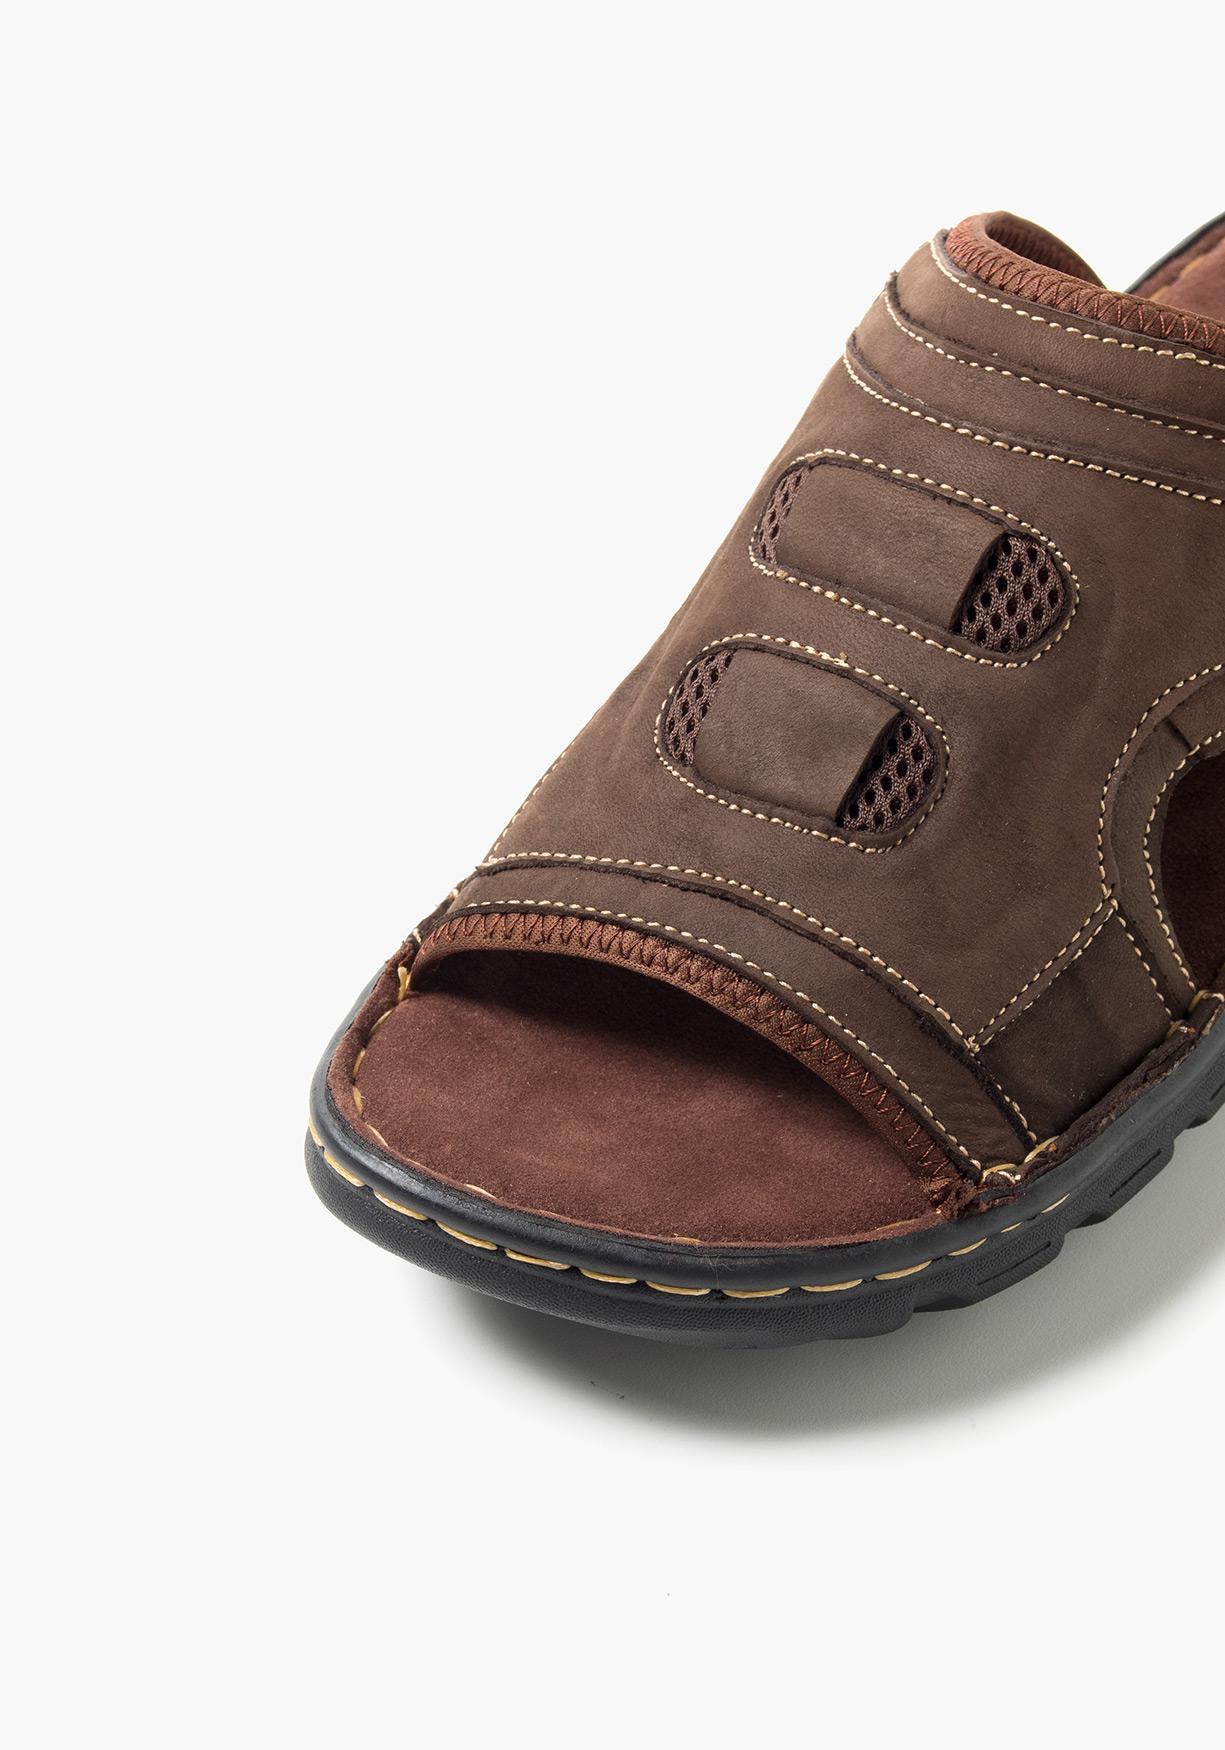 Zapatos marrones Beppi infantiles oFDcsf